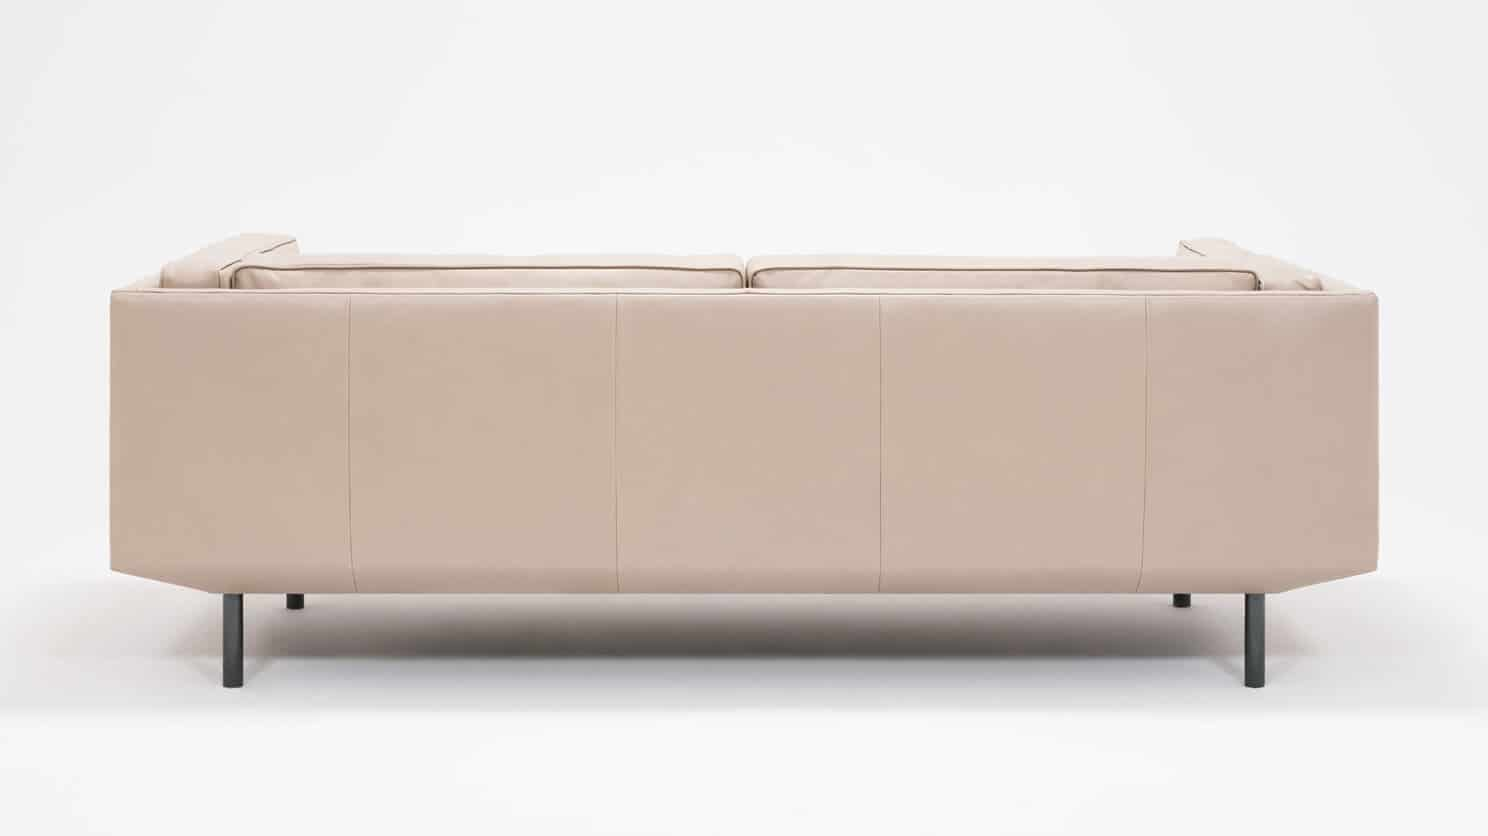 37154 01 05 sofa plateau 84 feather coachella warm grey back view